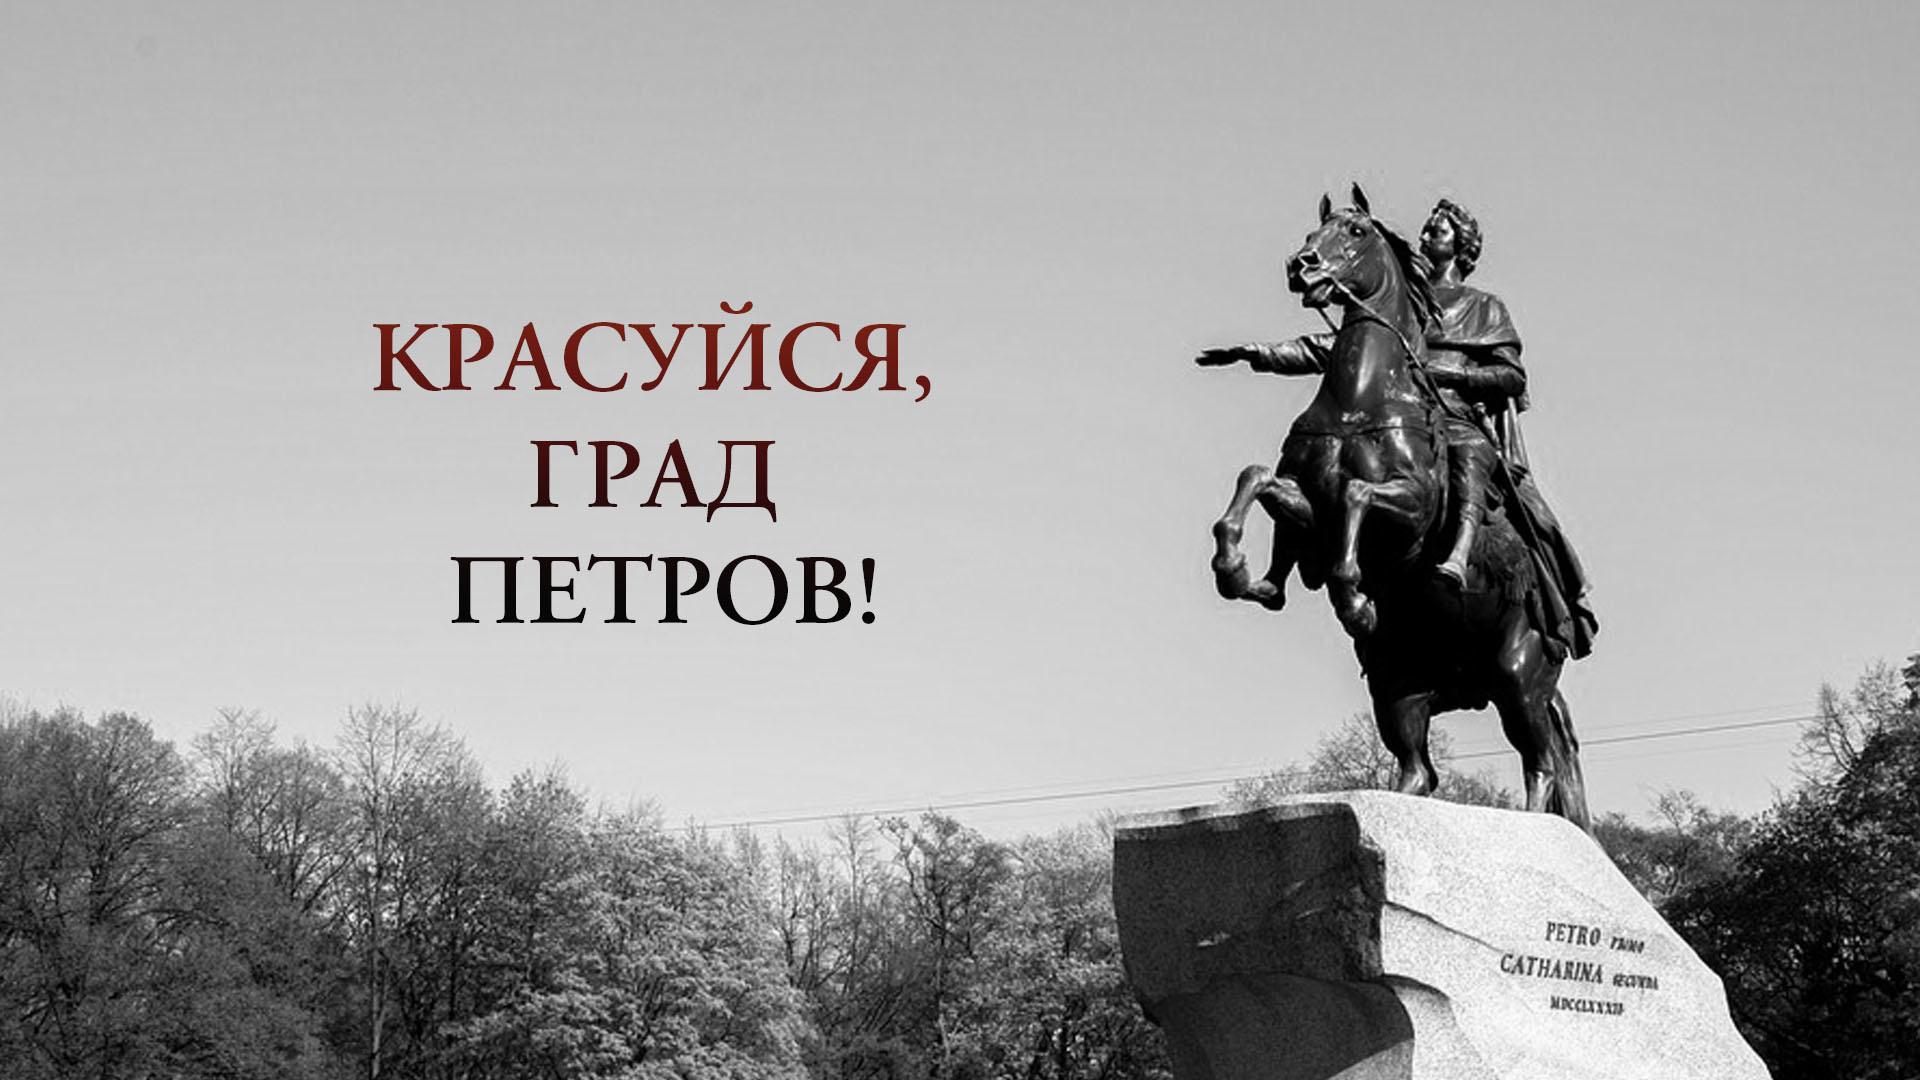 Красуйся, град Петров!